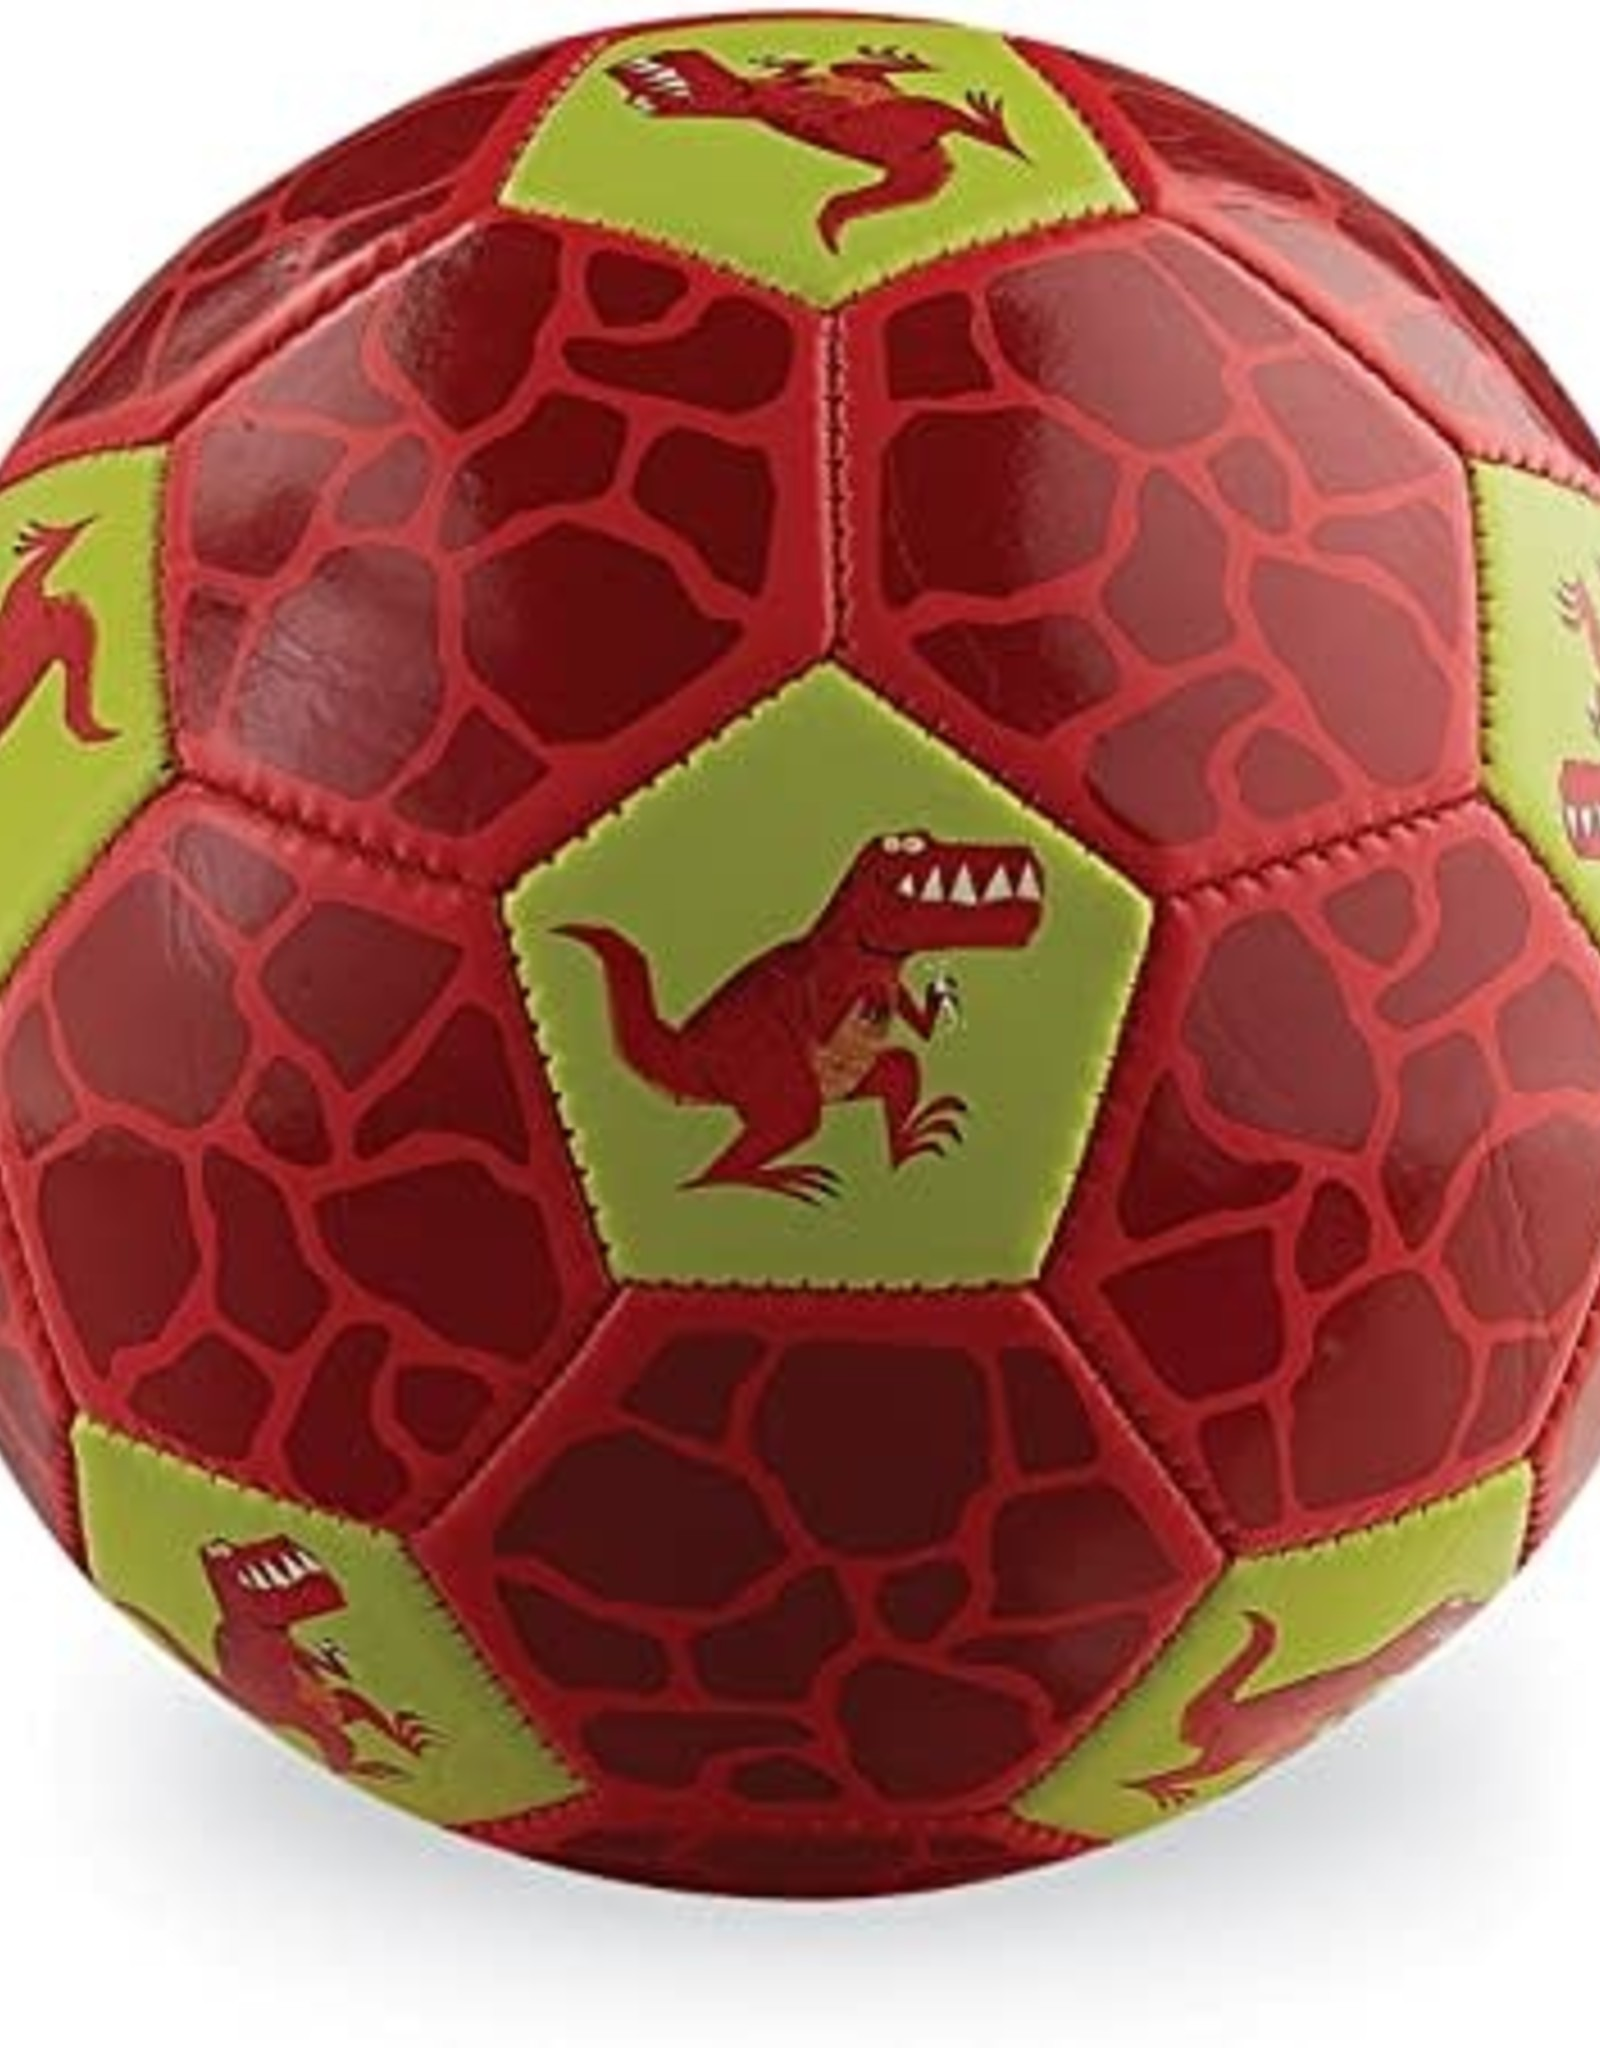 Crocodile Creek Soccer Ball - Dinosaur